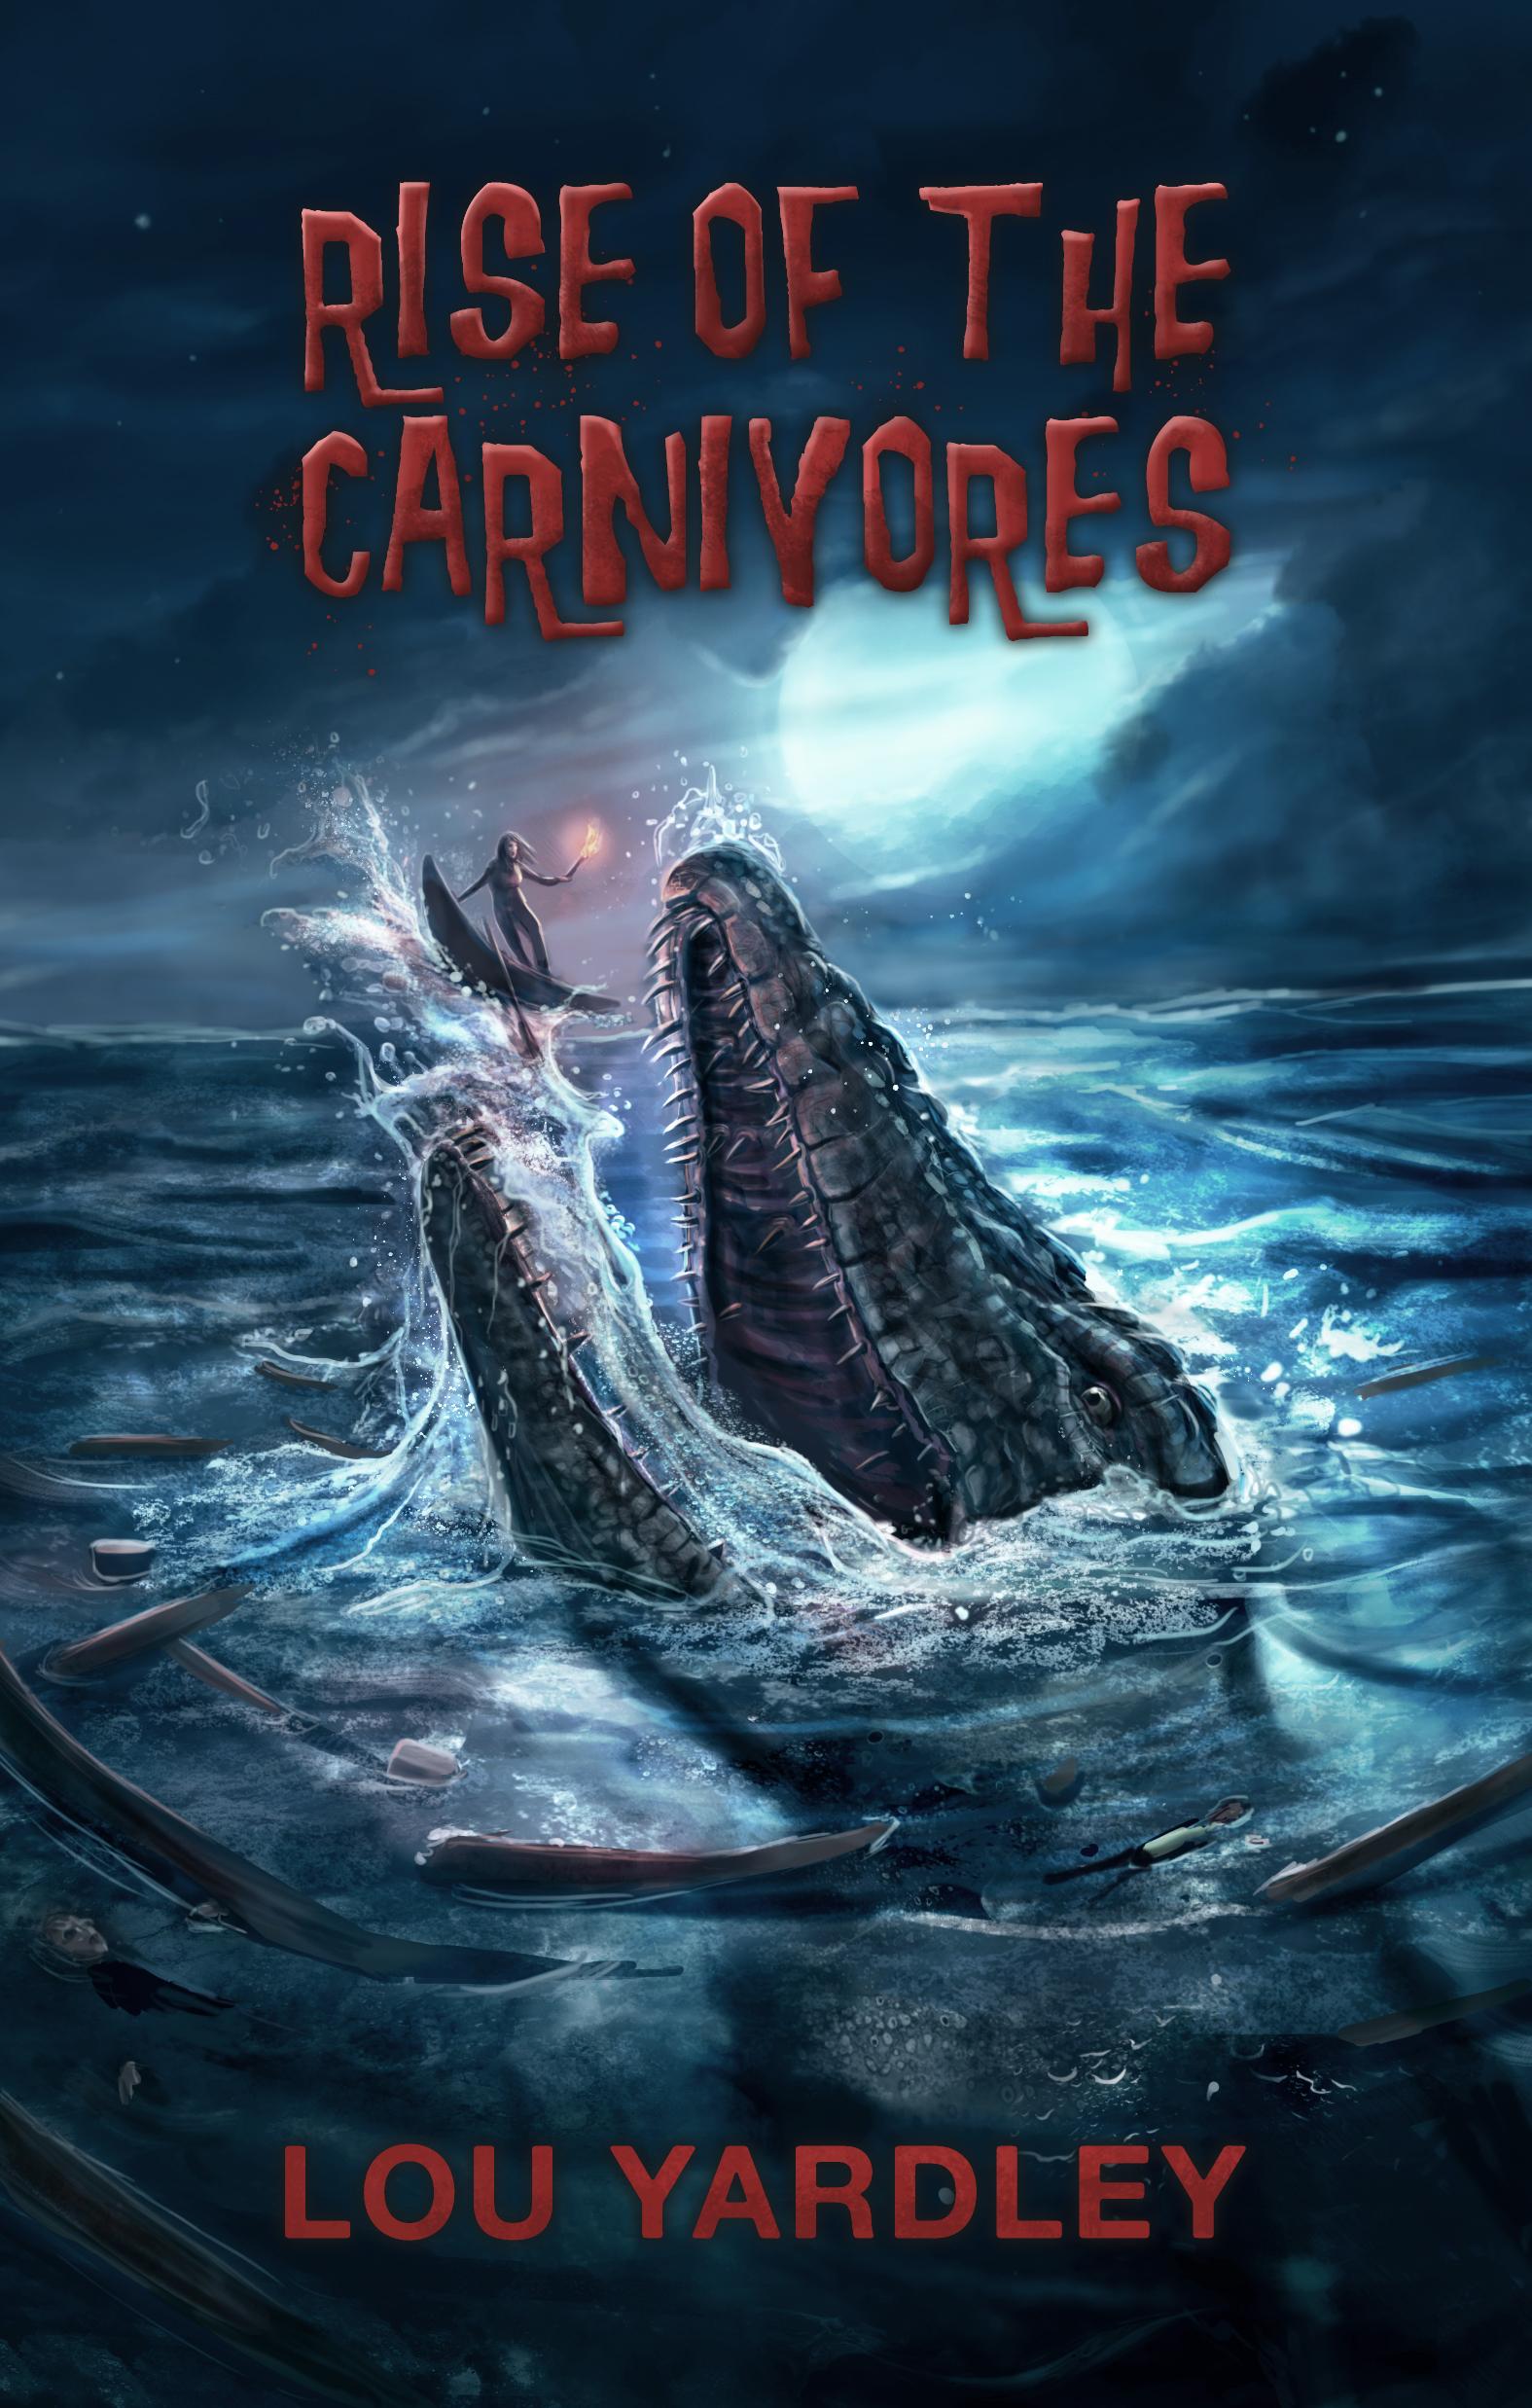 horror book cover, dinosaur mosasaurus